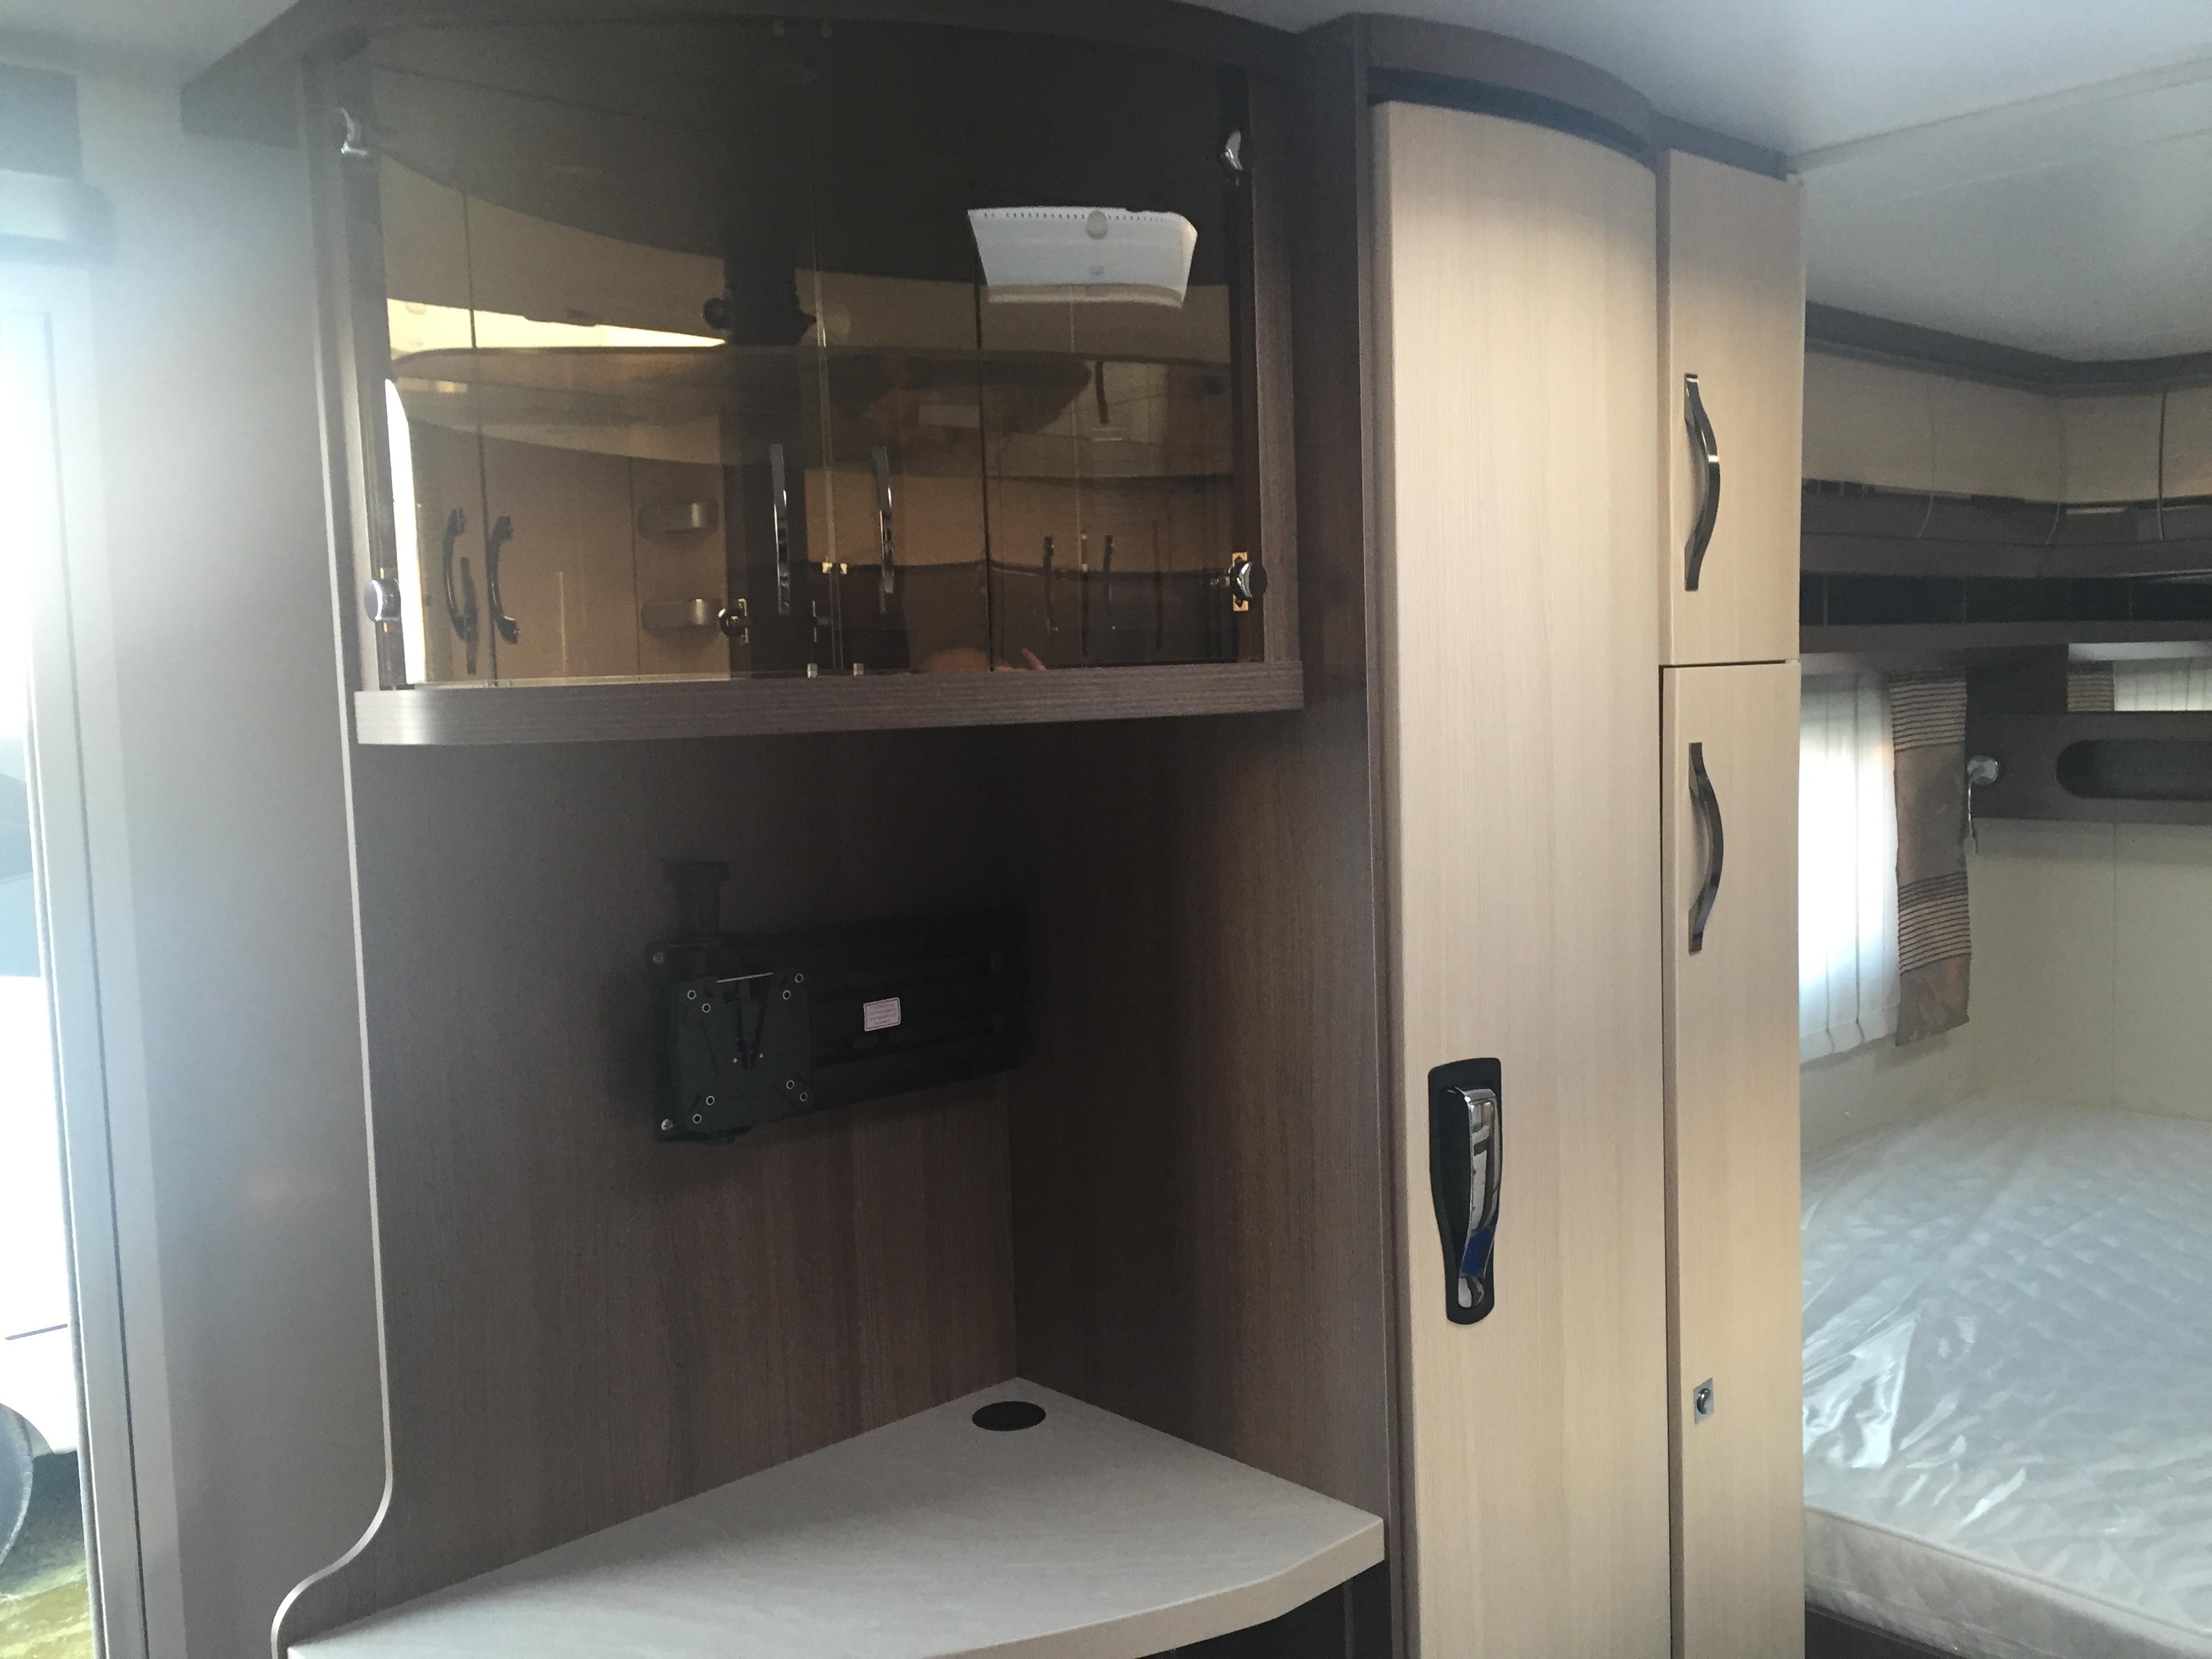 hobby 660 wfc prestige neuf de 2017 caravane en vente oberschaeffolsheim rhin 67. Black Bedroom Furniture Sets. Home Design Ideas